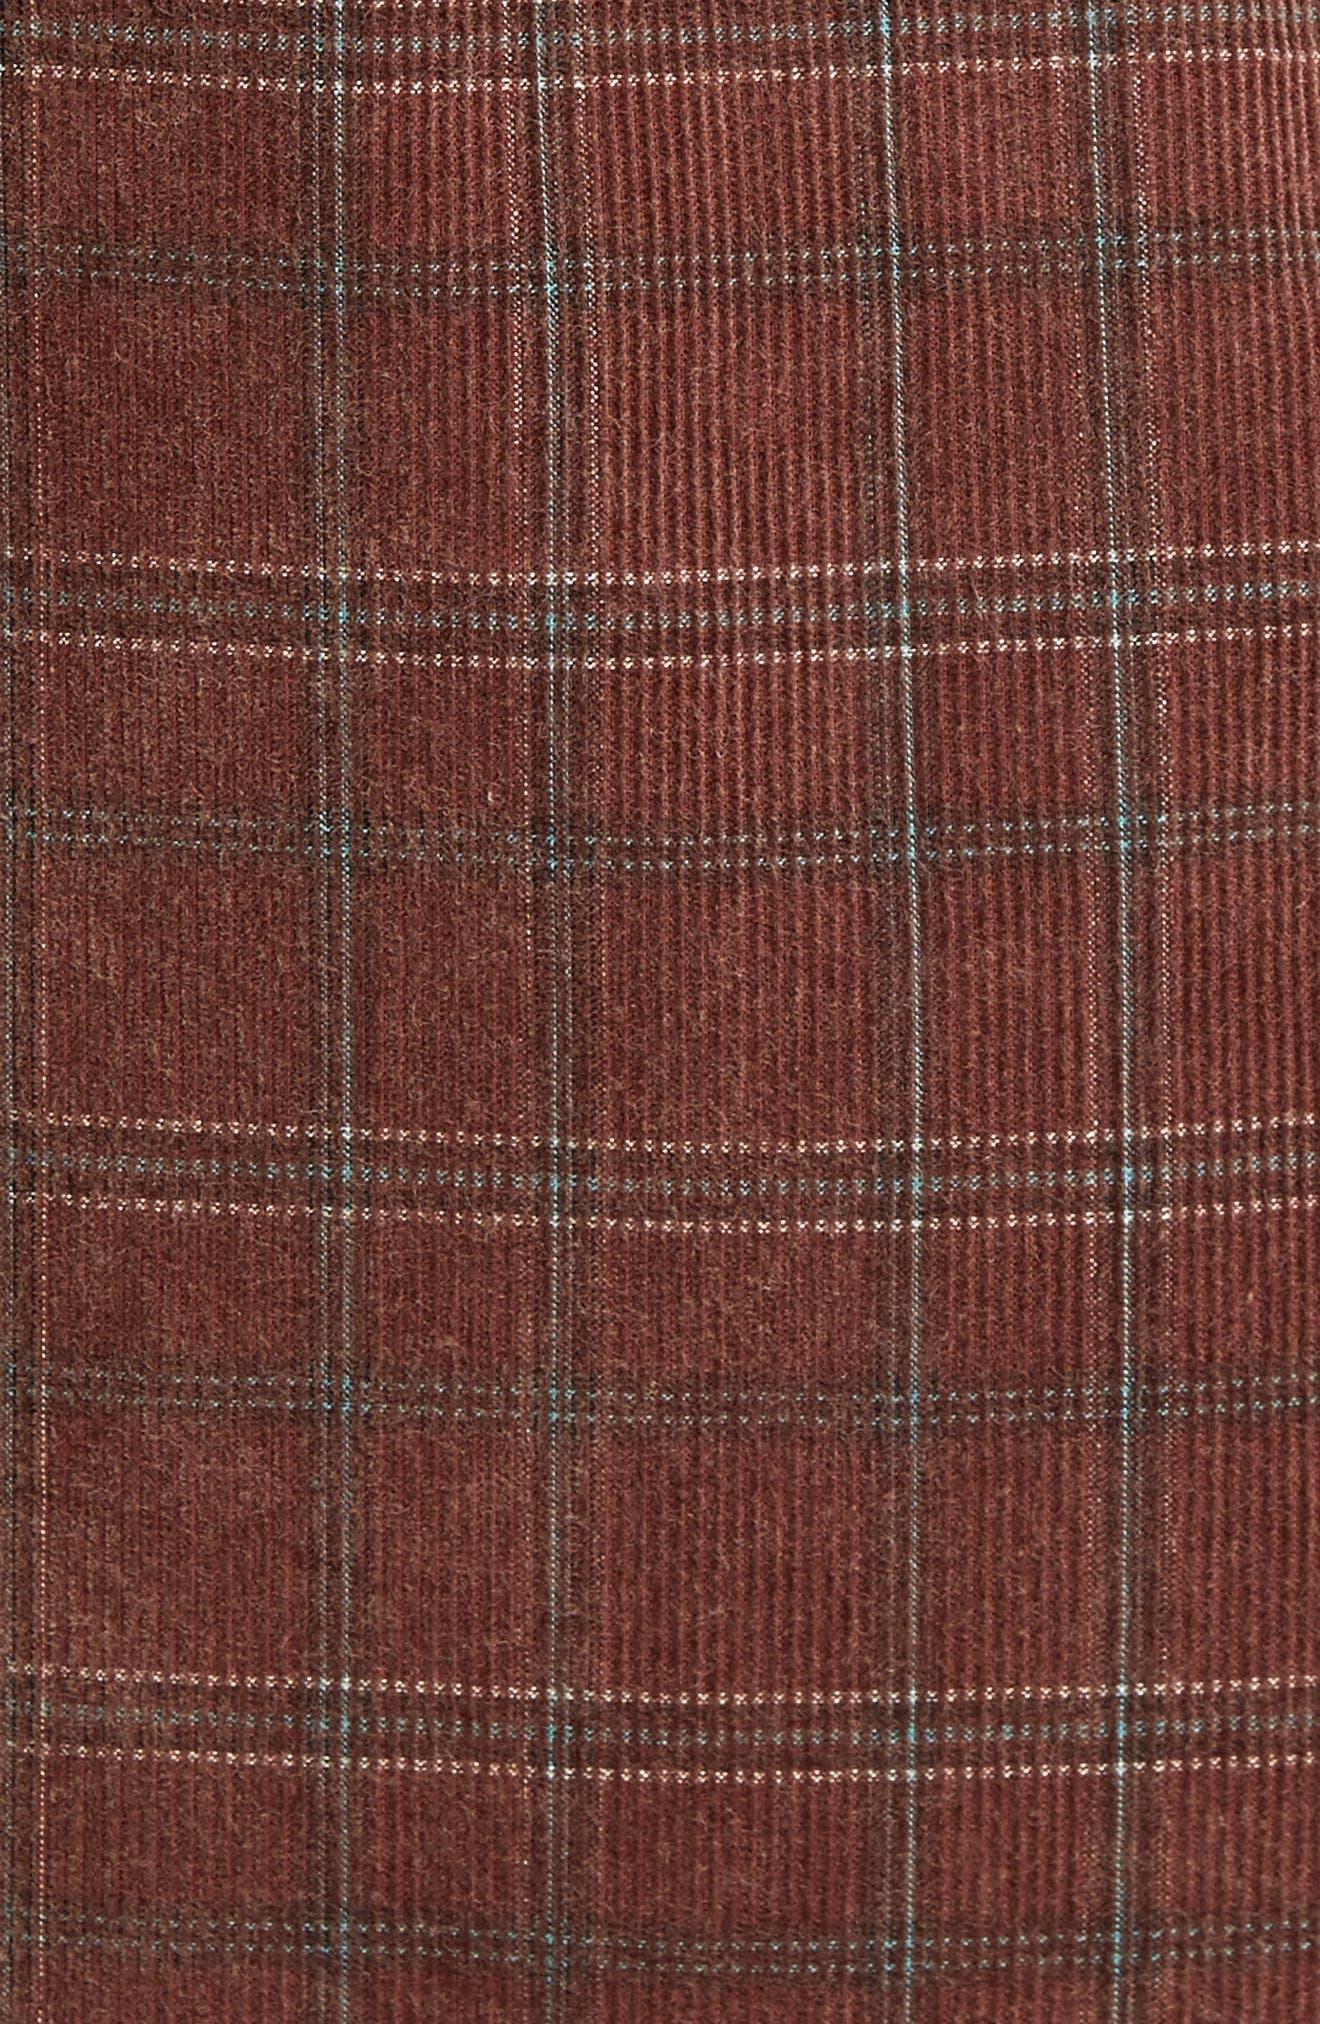 Bradley Corduroy Shirt,                             Alternate thumbnail 5, color,                             Burgundy